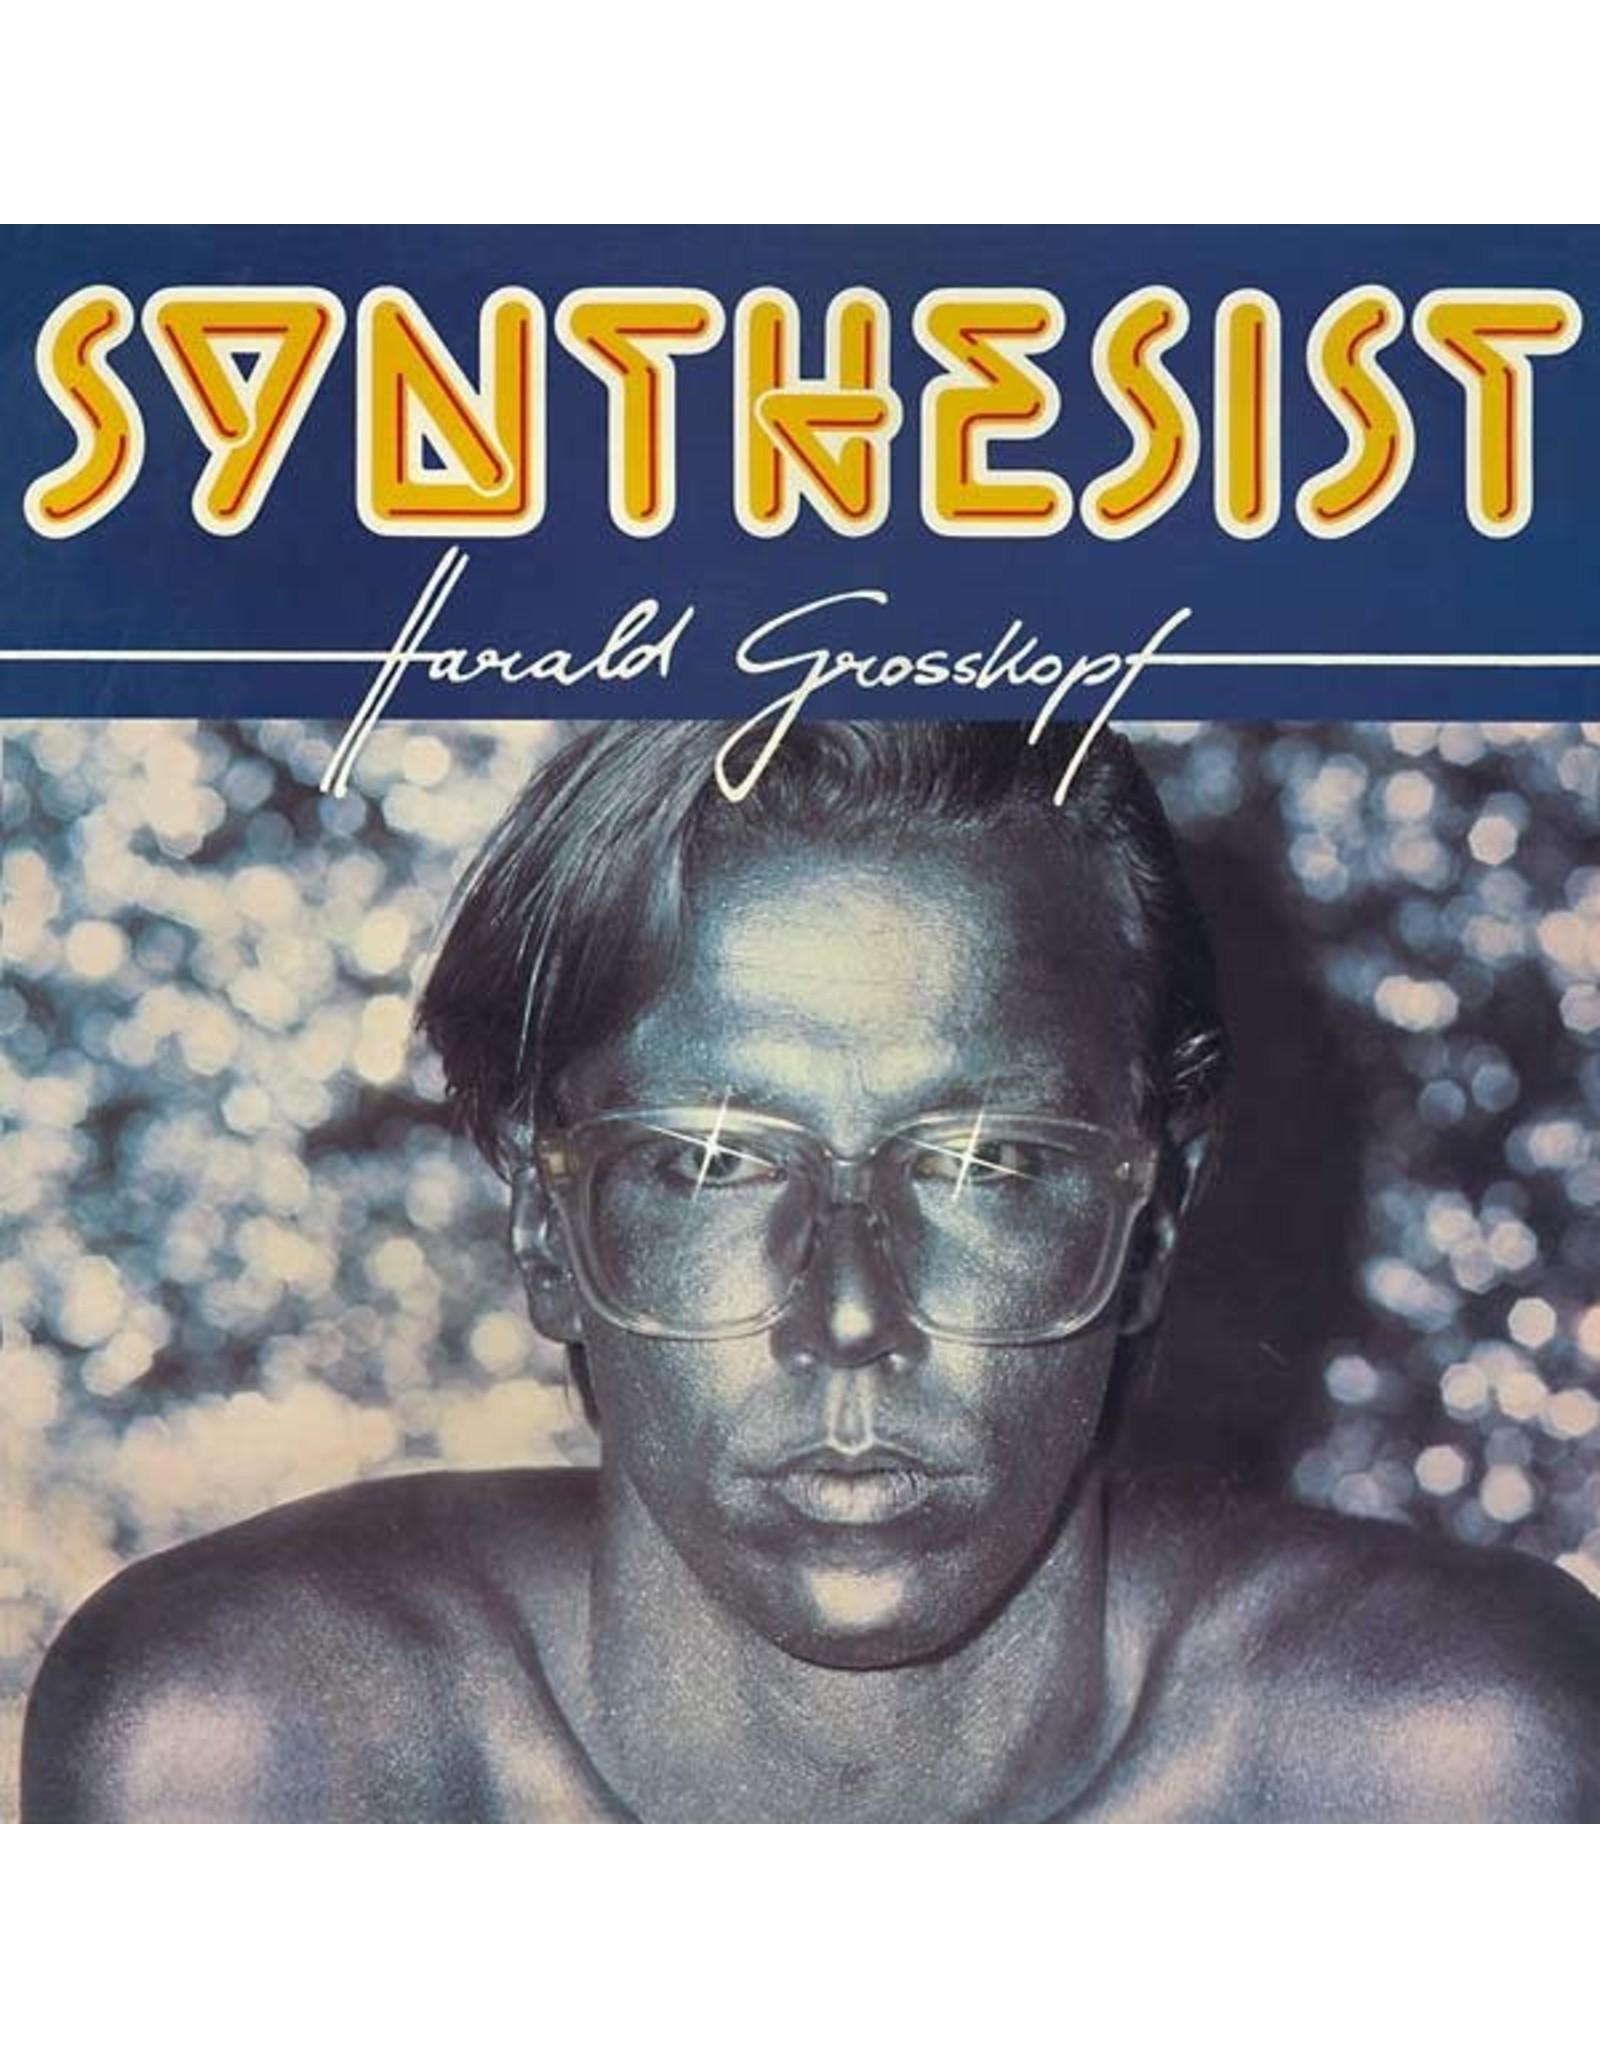 New Vinyl Harald Grosskopf - Synthesist LP